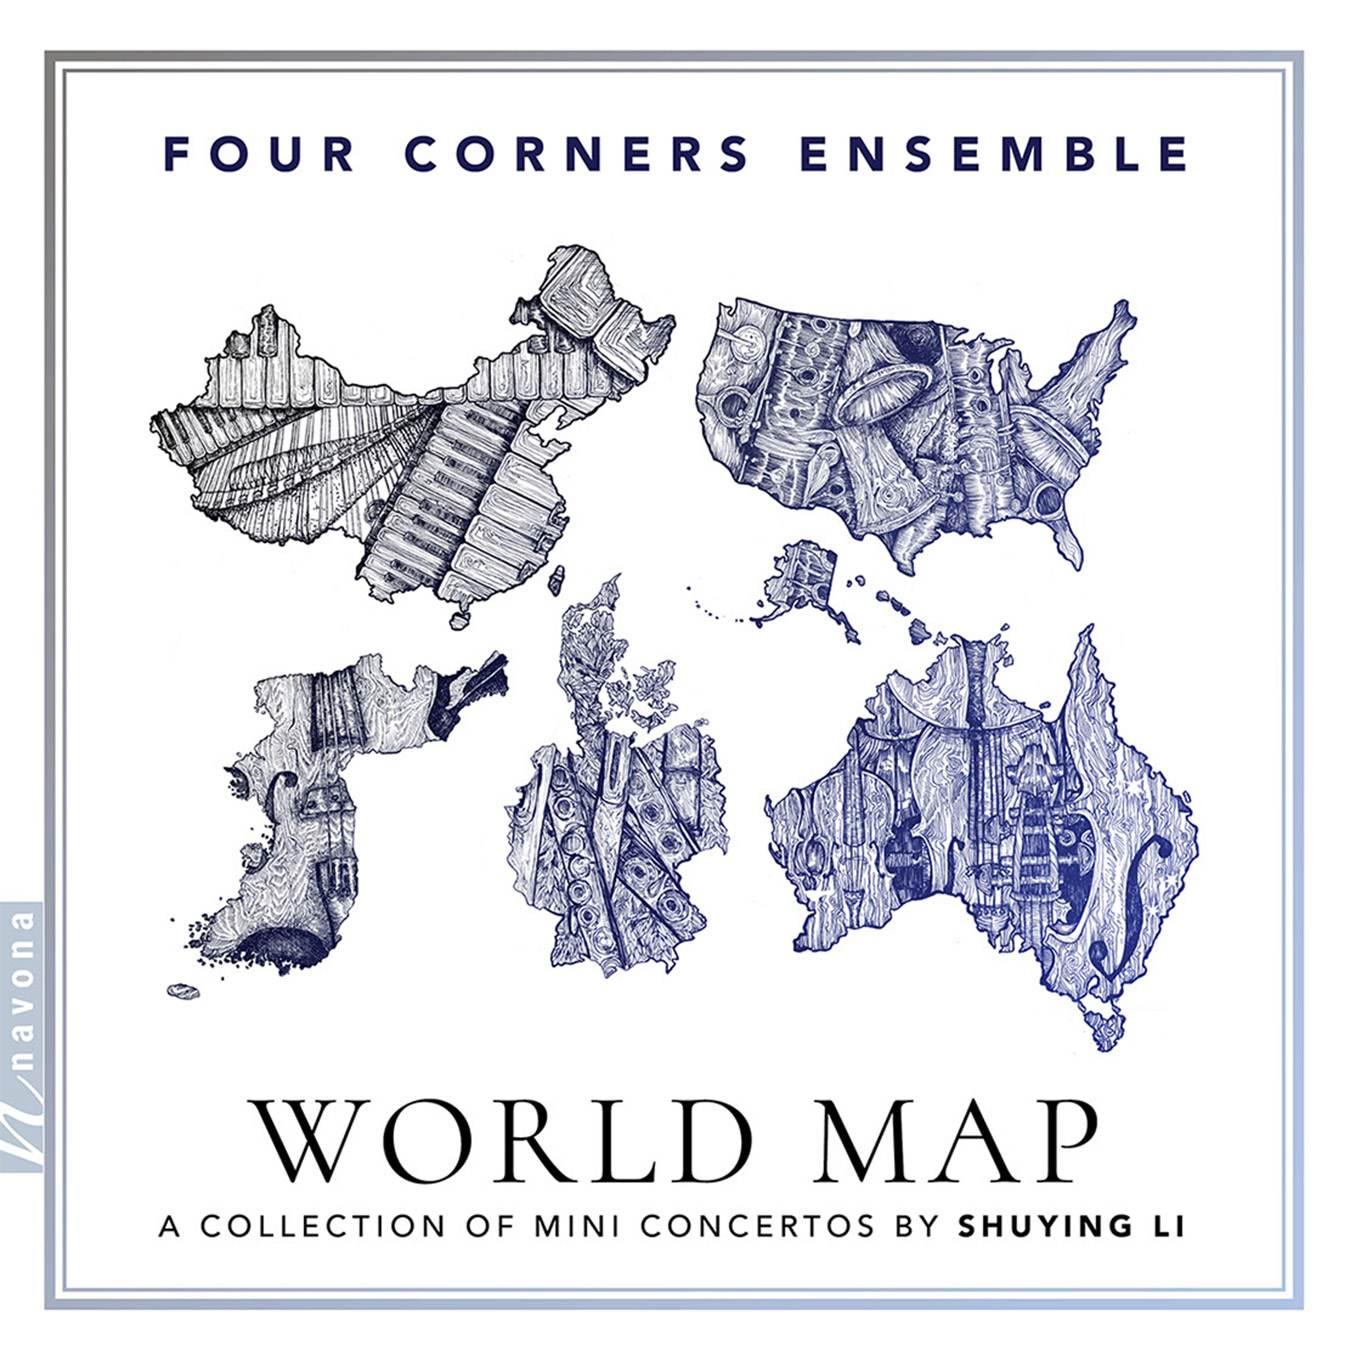 WORLD MAP- Album Cover